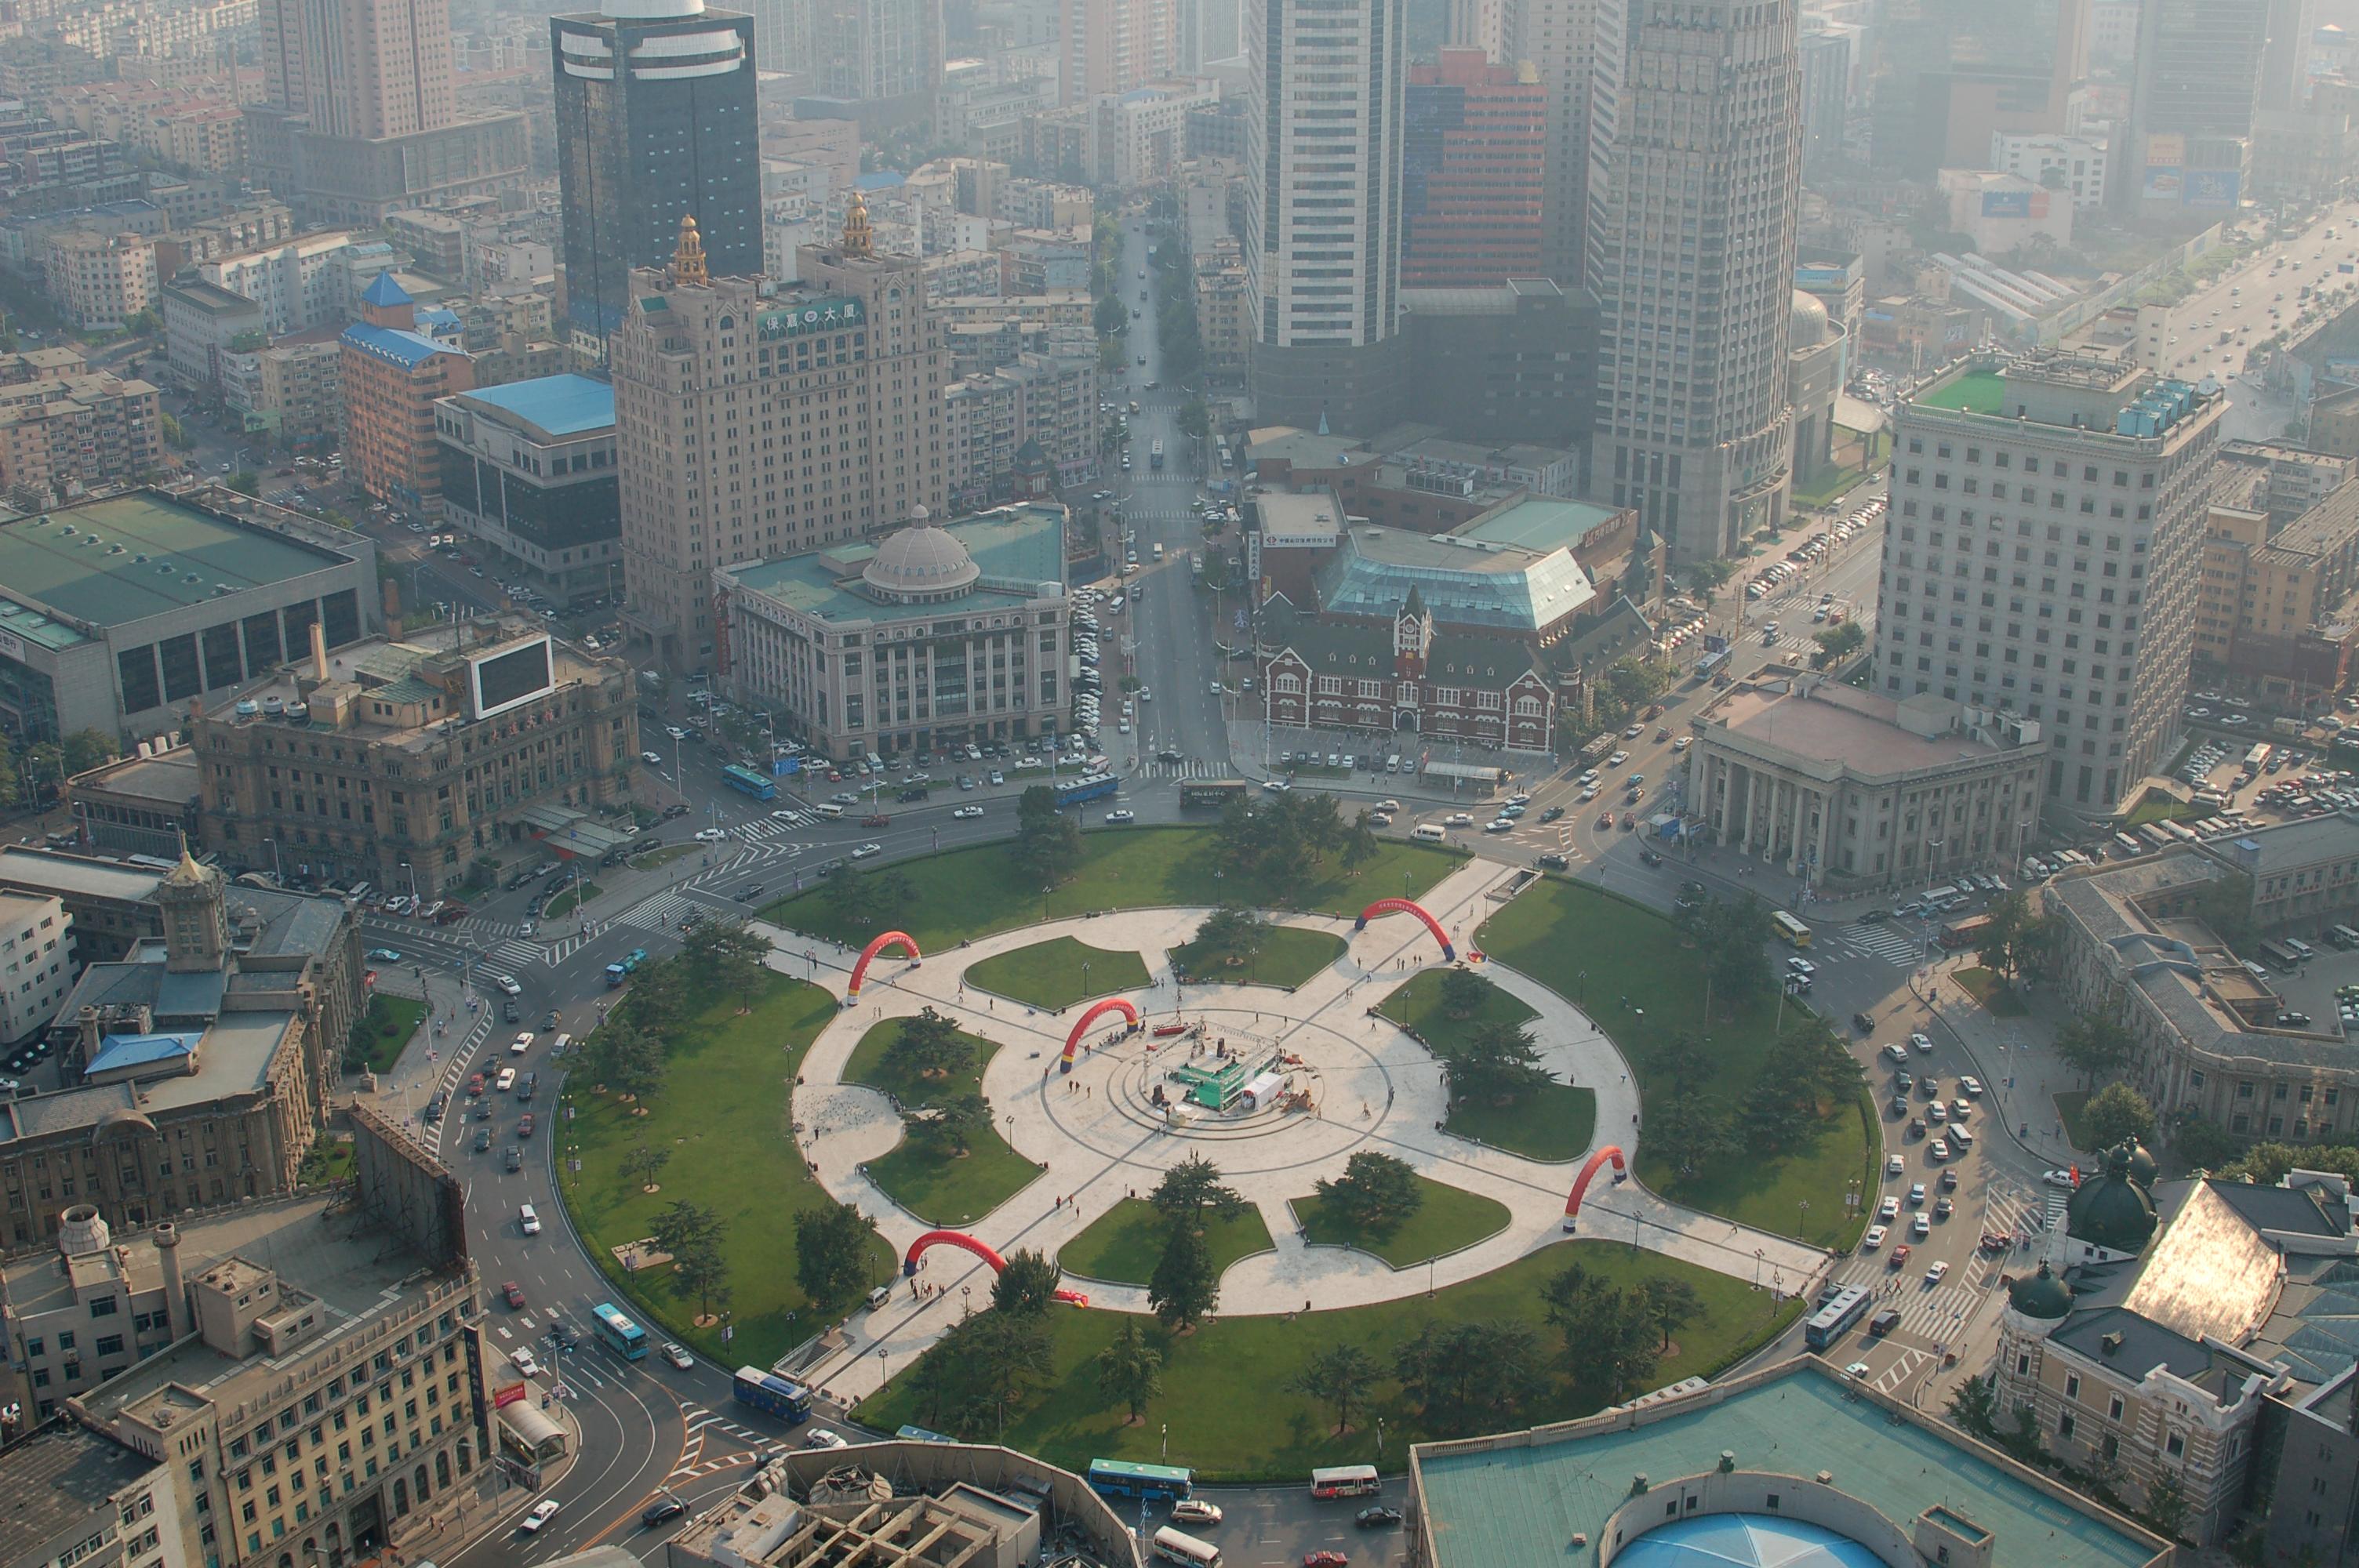 https://upload.wikimedia.org/wikipedia/commons/5/57/Zhongshan_Square%2C_Dalian.jpg